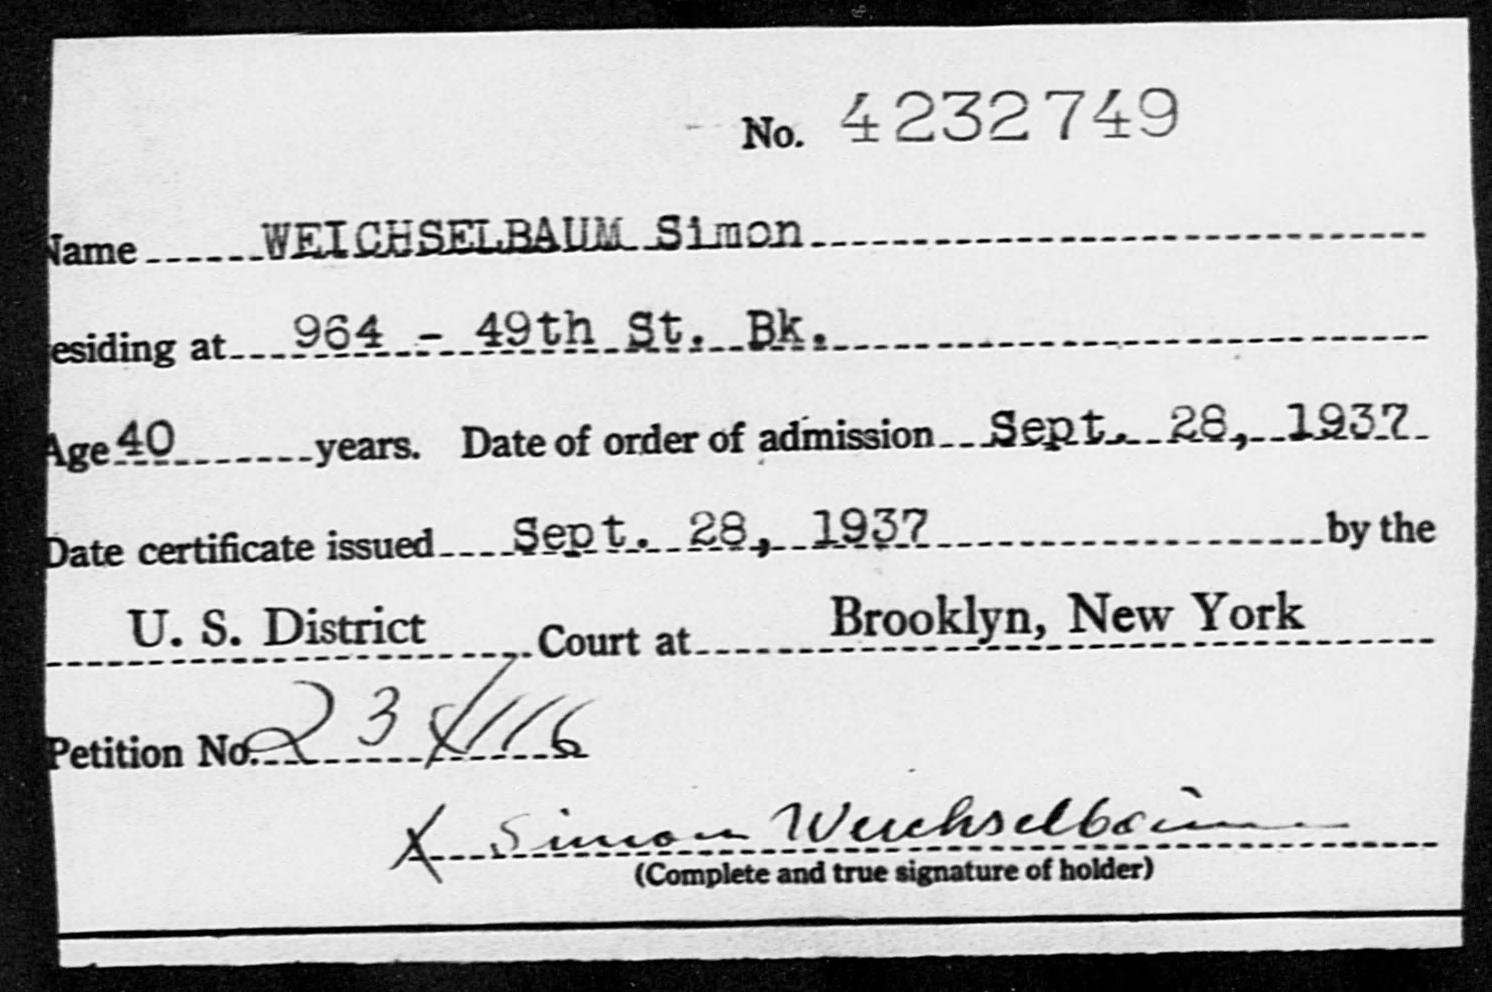 WEICHSELBAUM Simon - Born: [BLANK], Naturalized: 1937